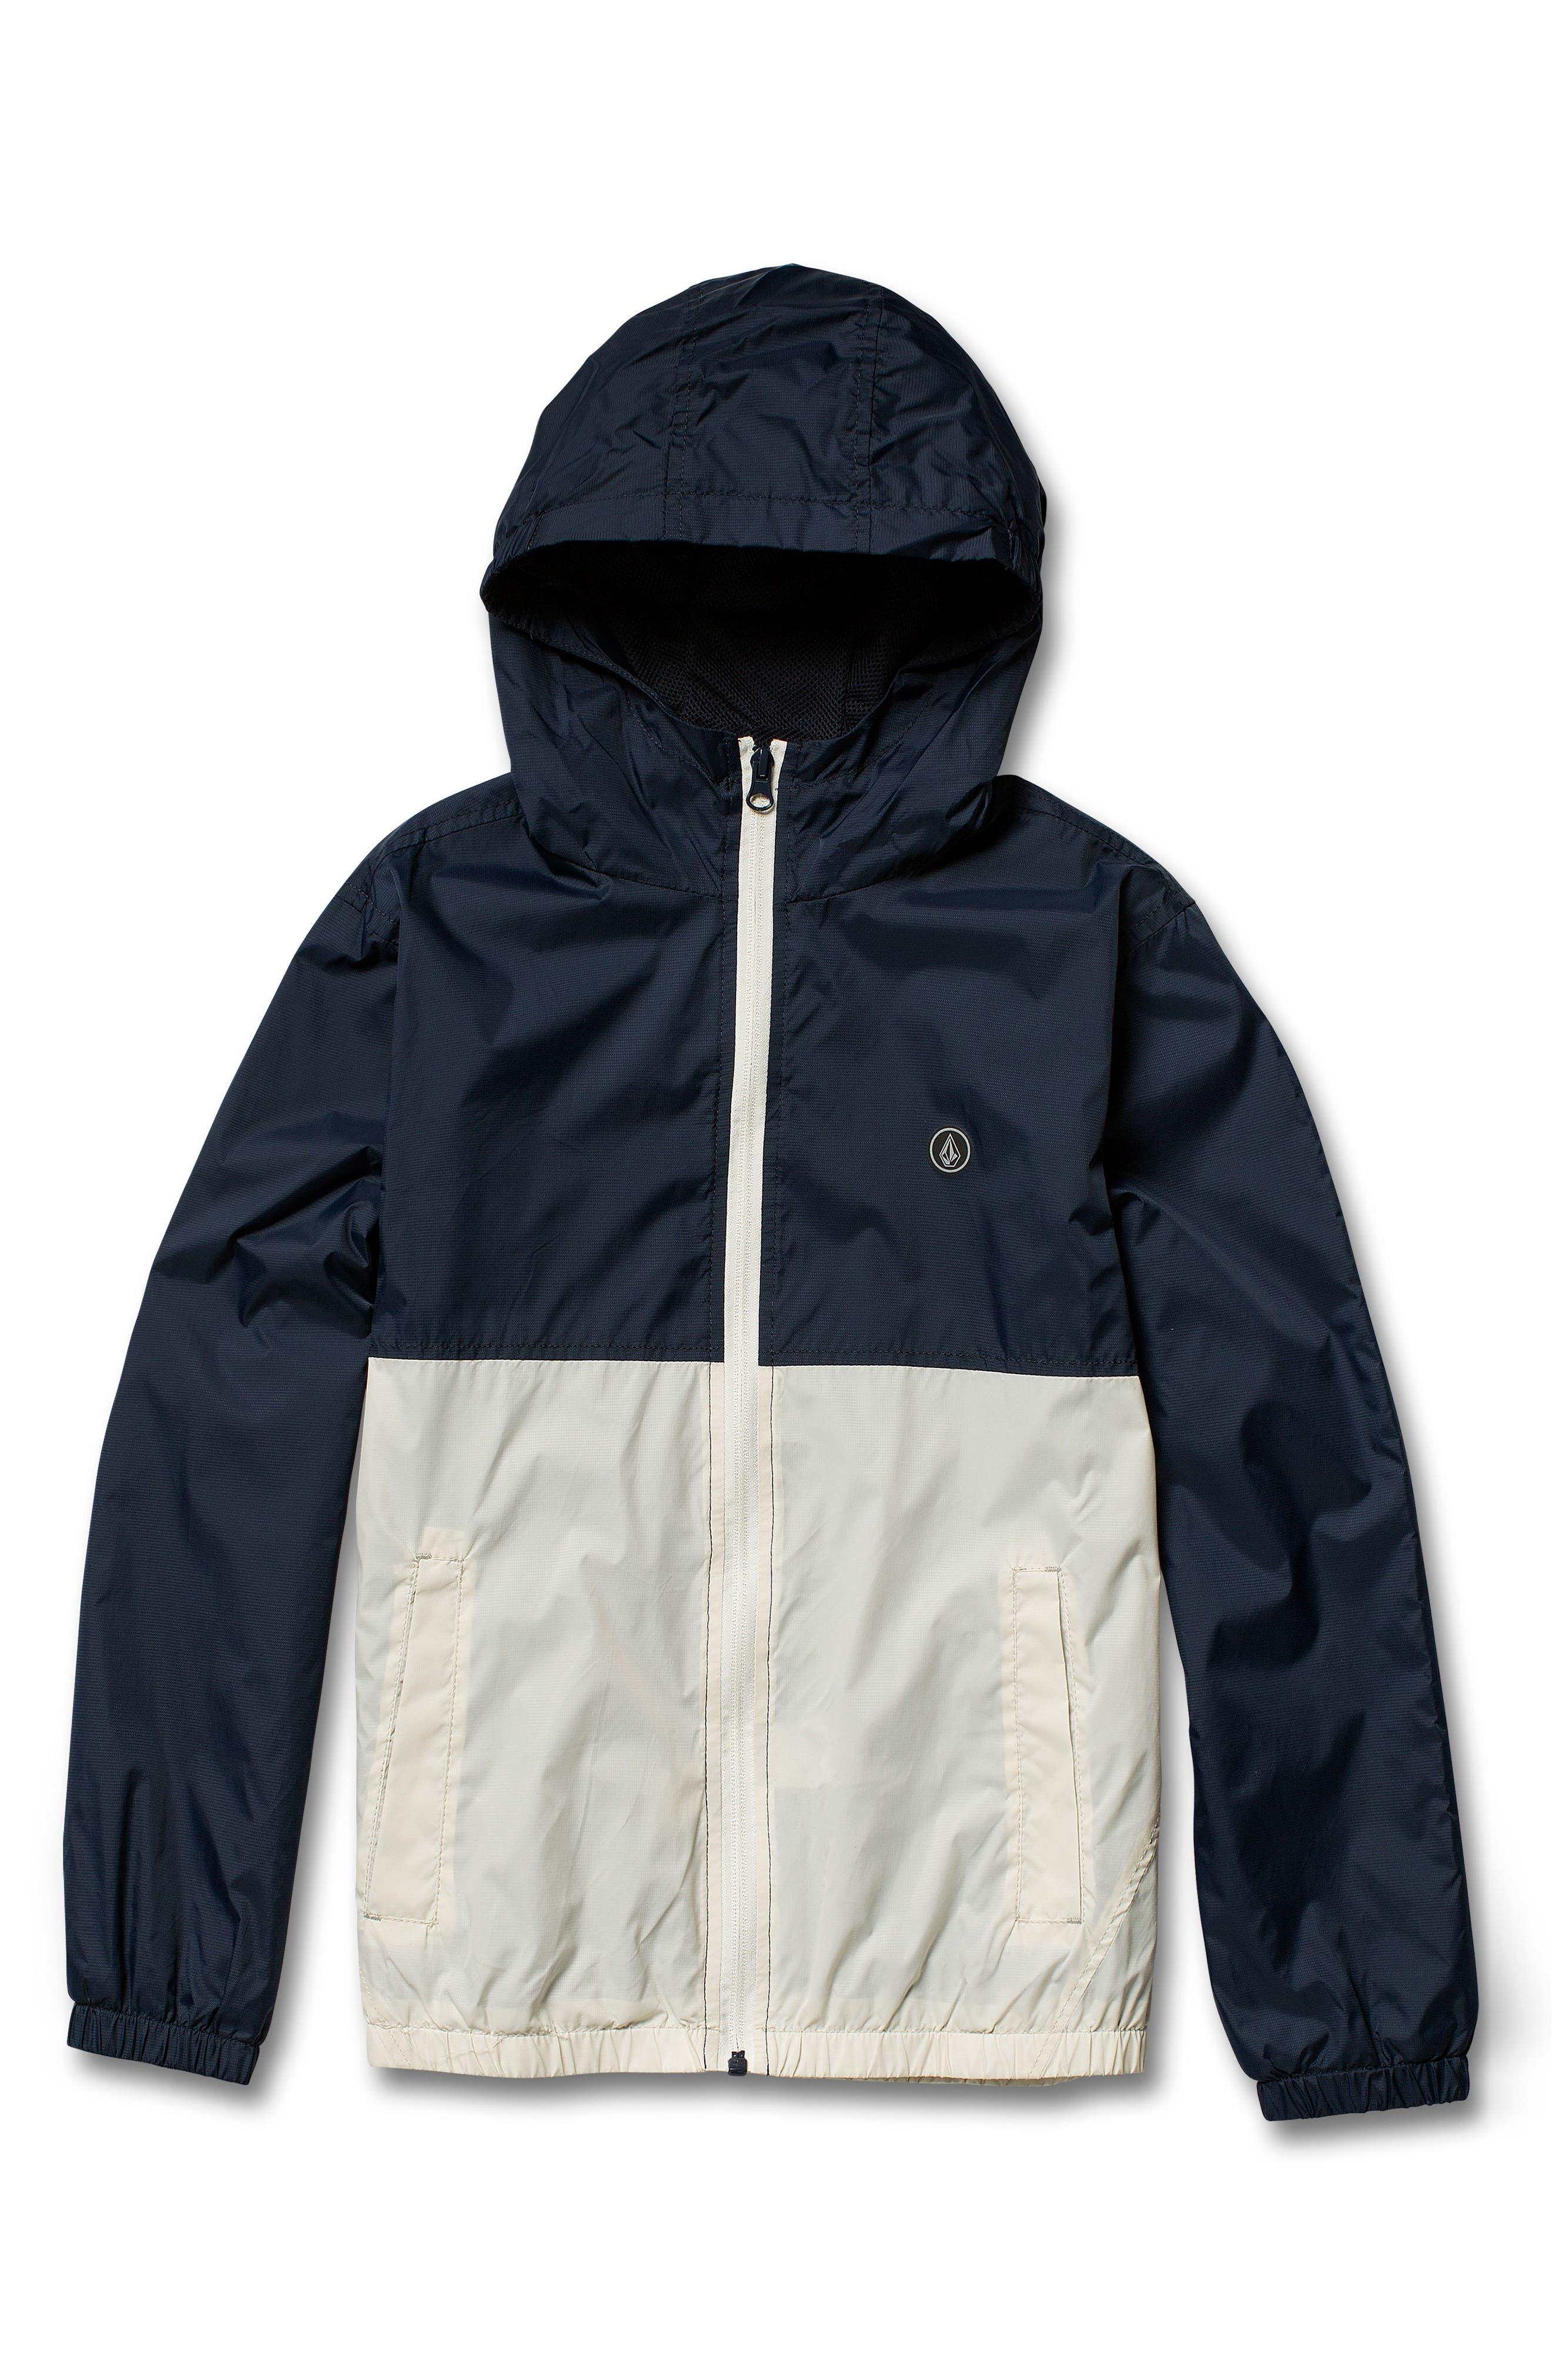 Ermont Hooded Nylon Jacket,                             Main thumbnail 1, color,                             MELINDIGO